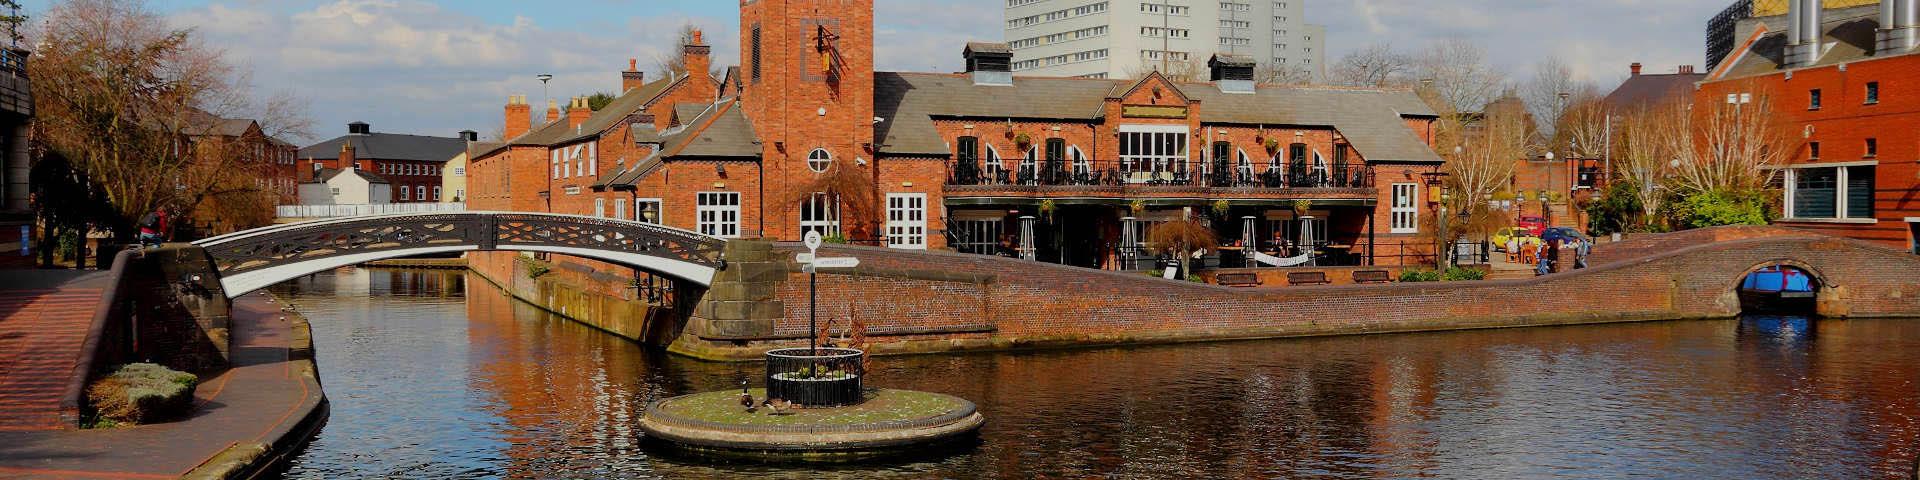 Birmingham uk hero edit